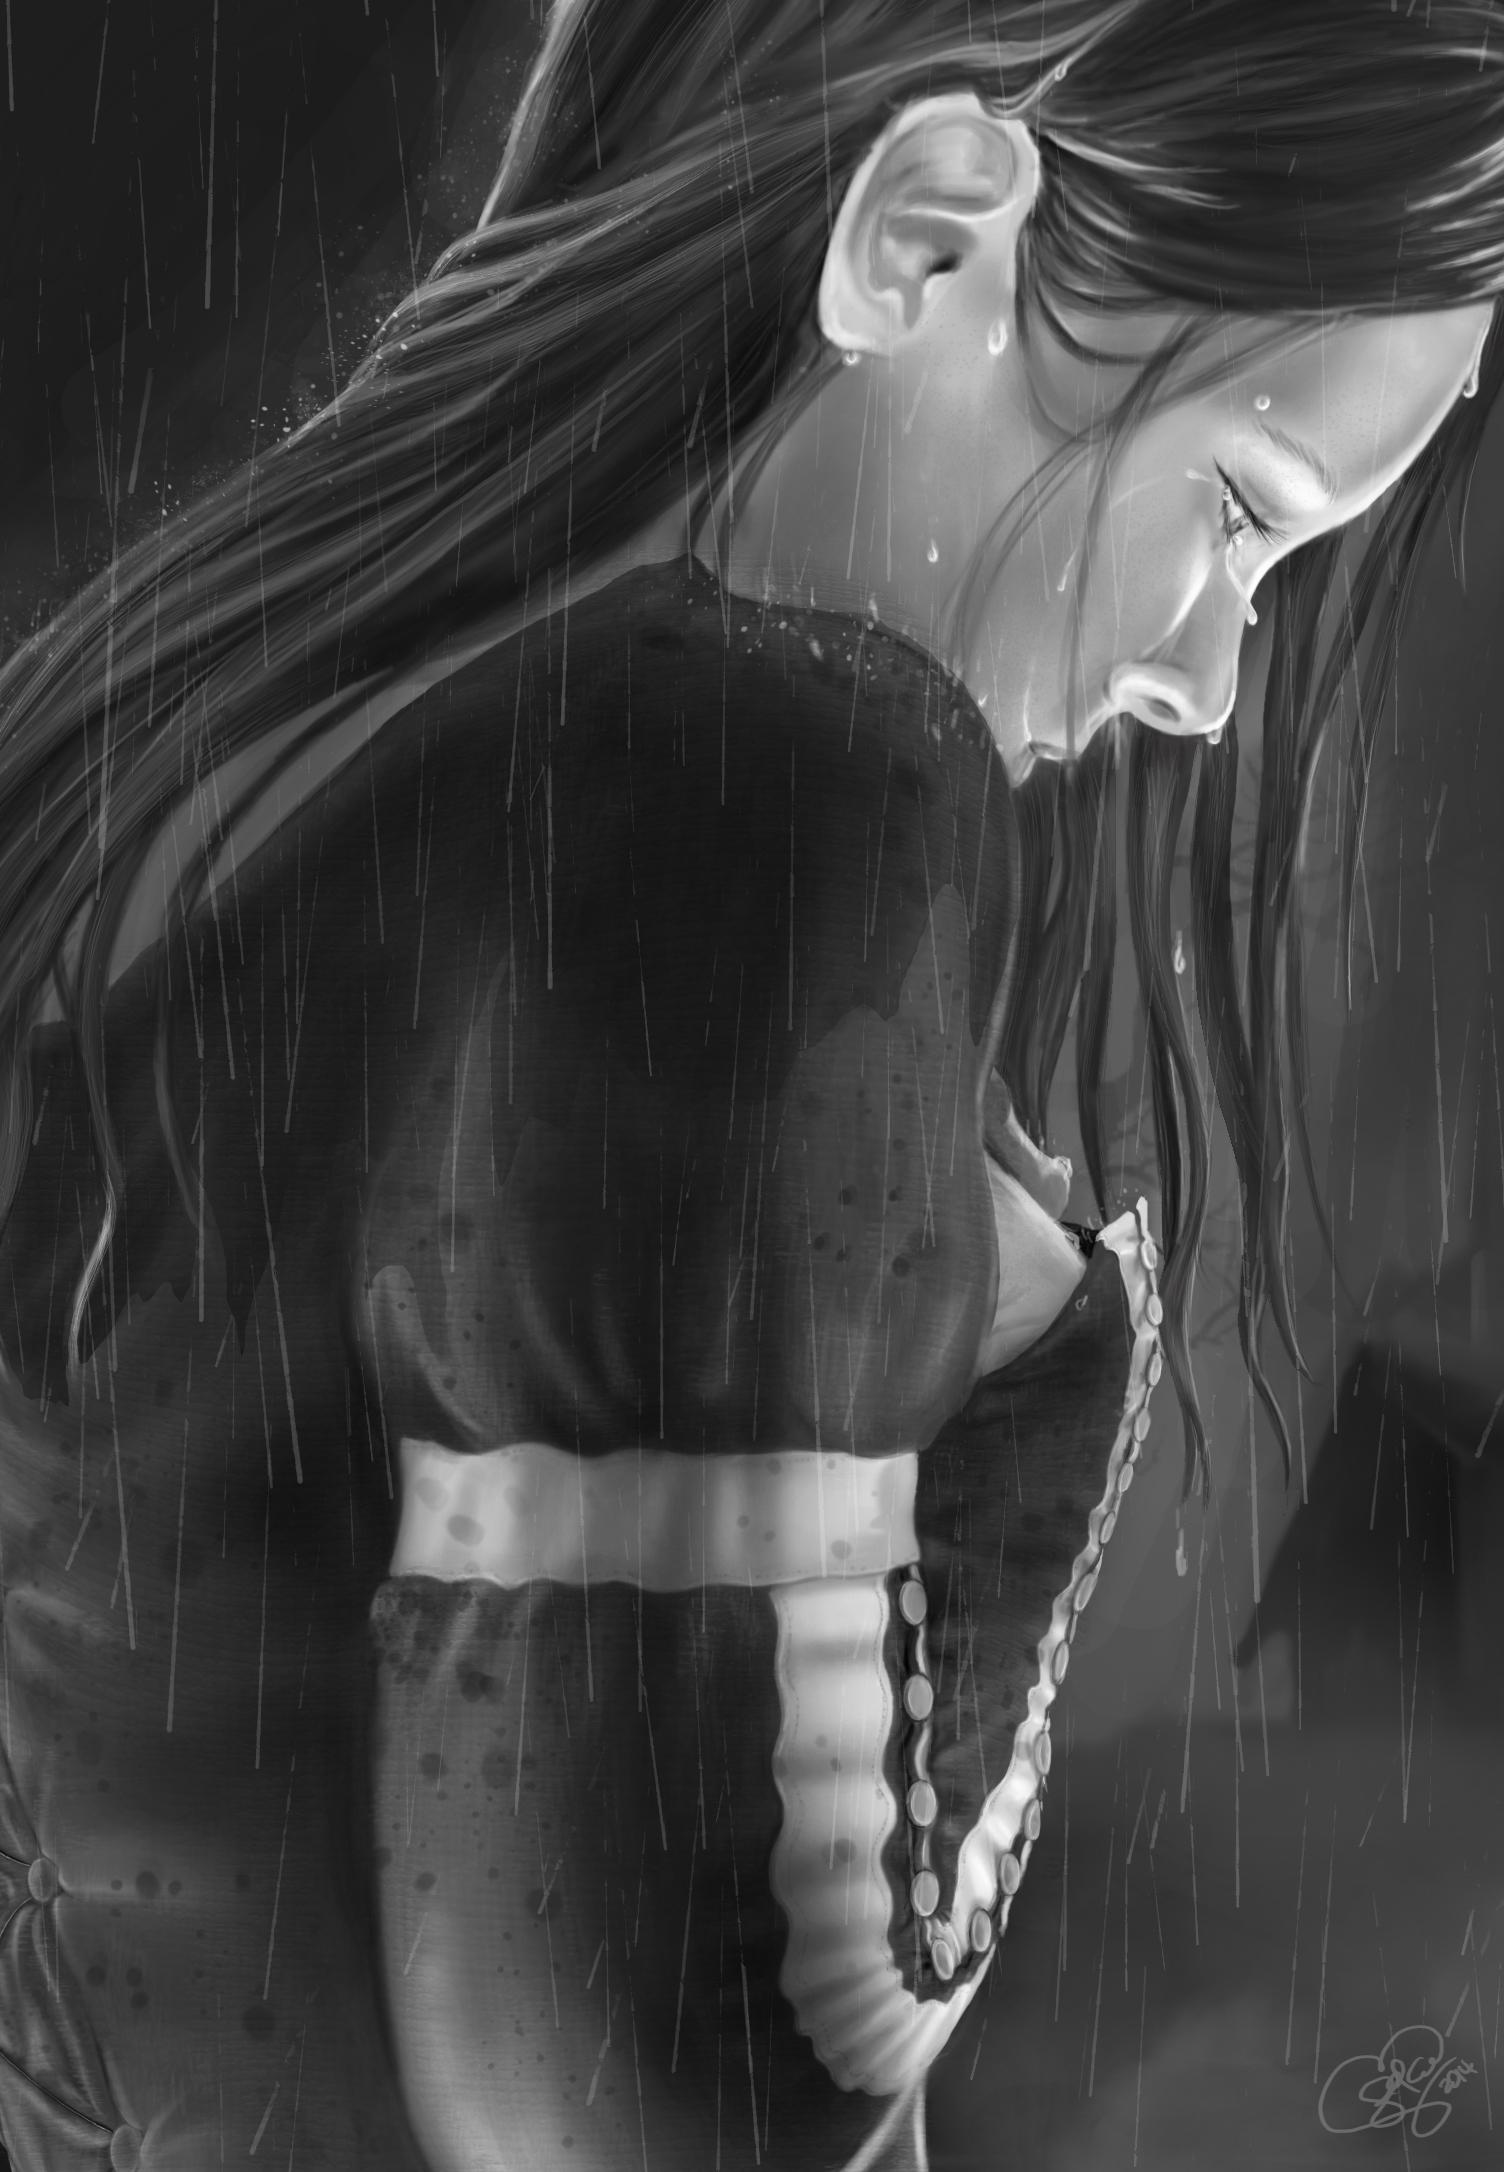 Sorcha's Tears